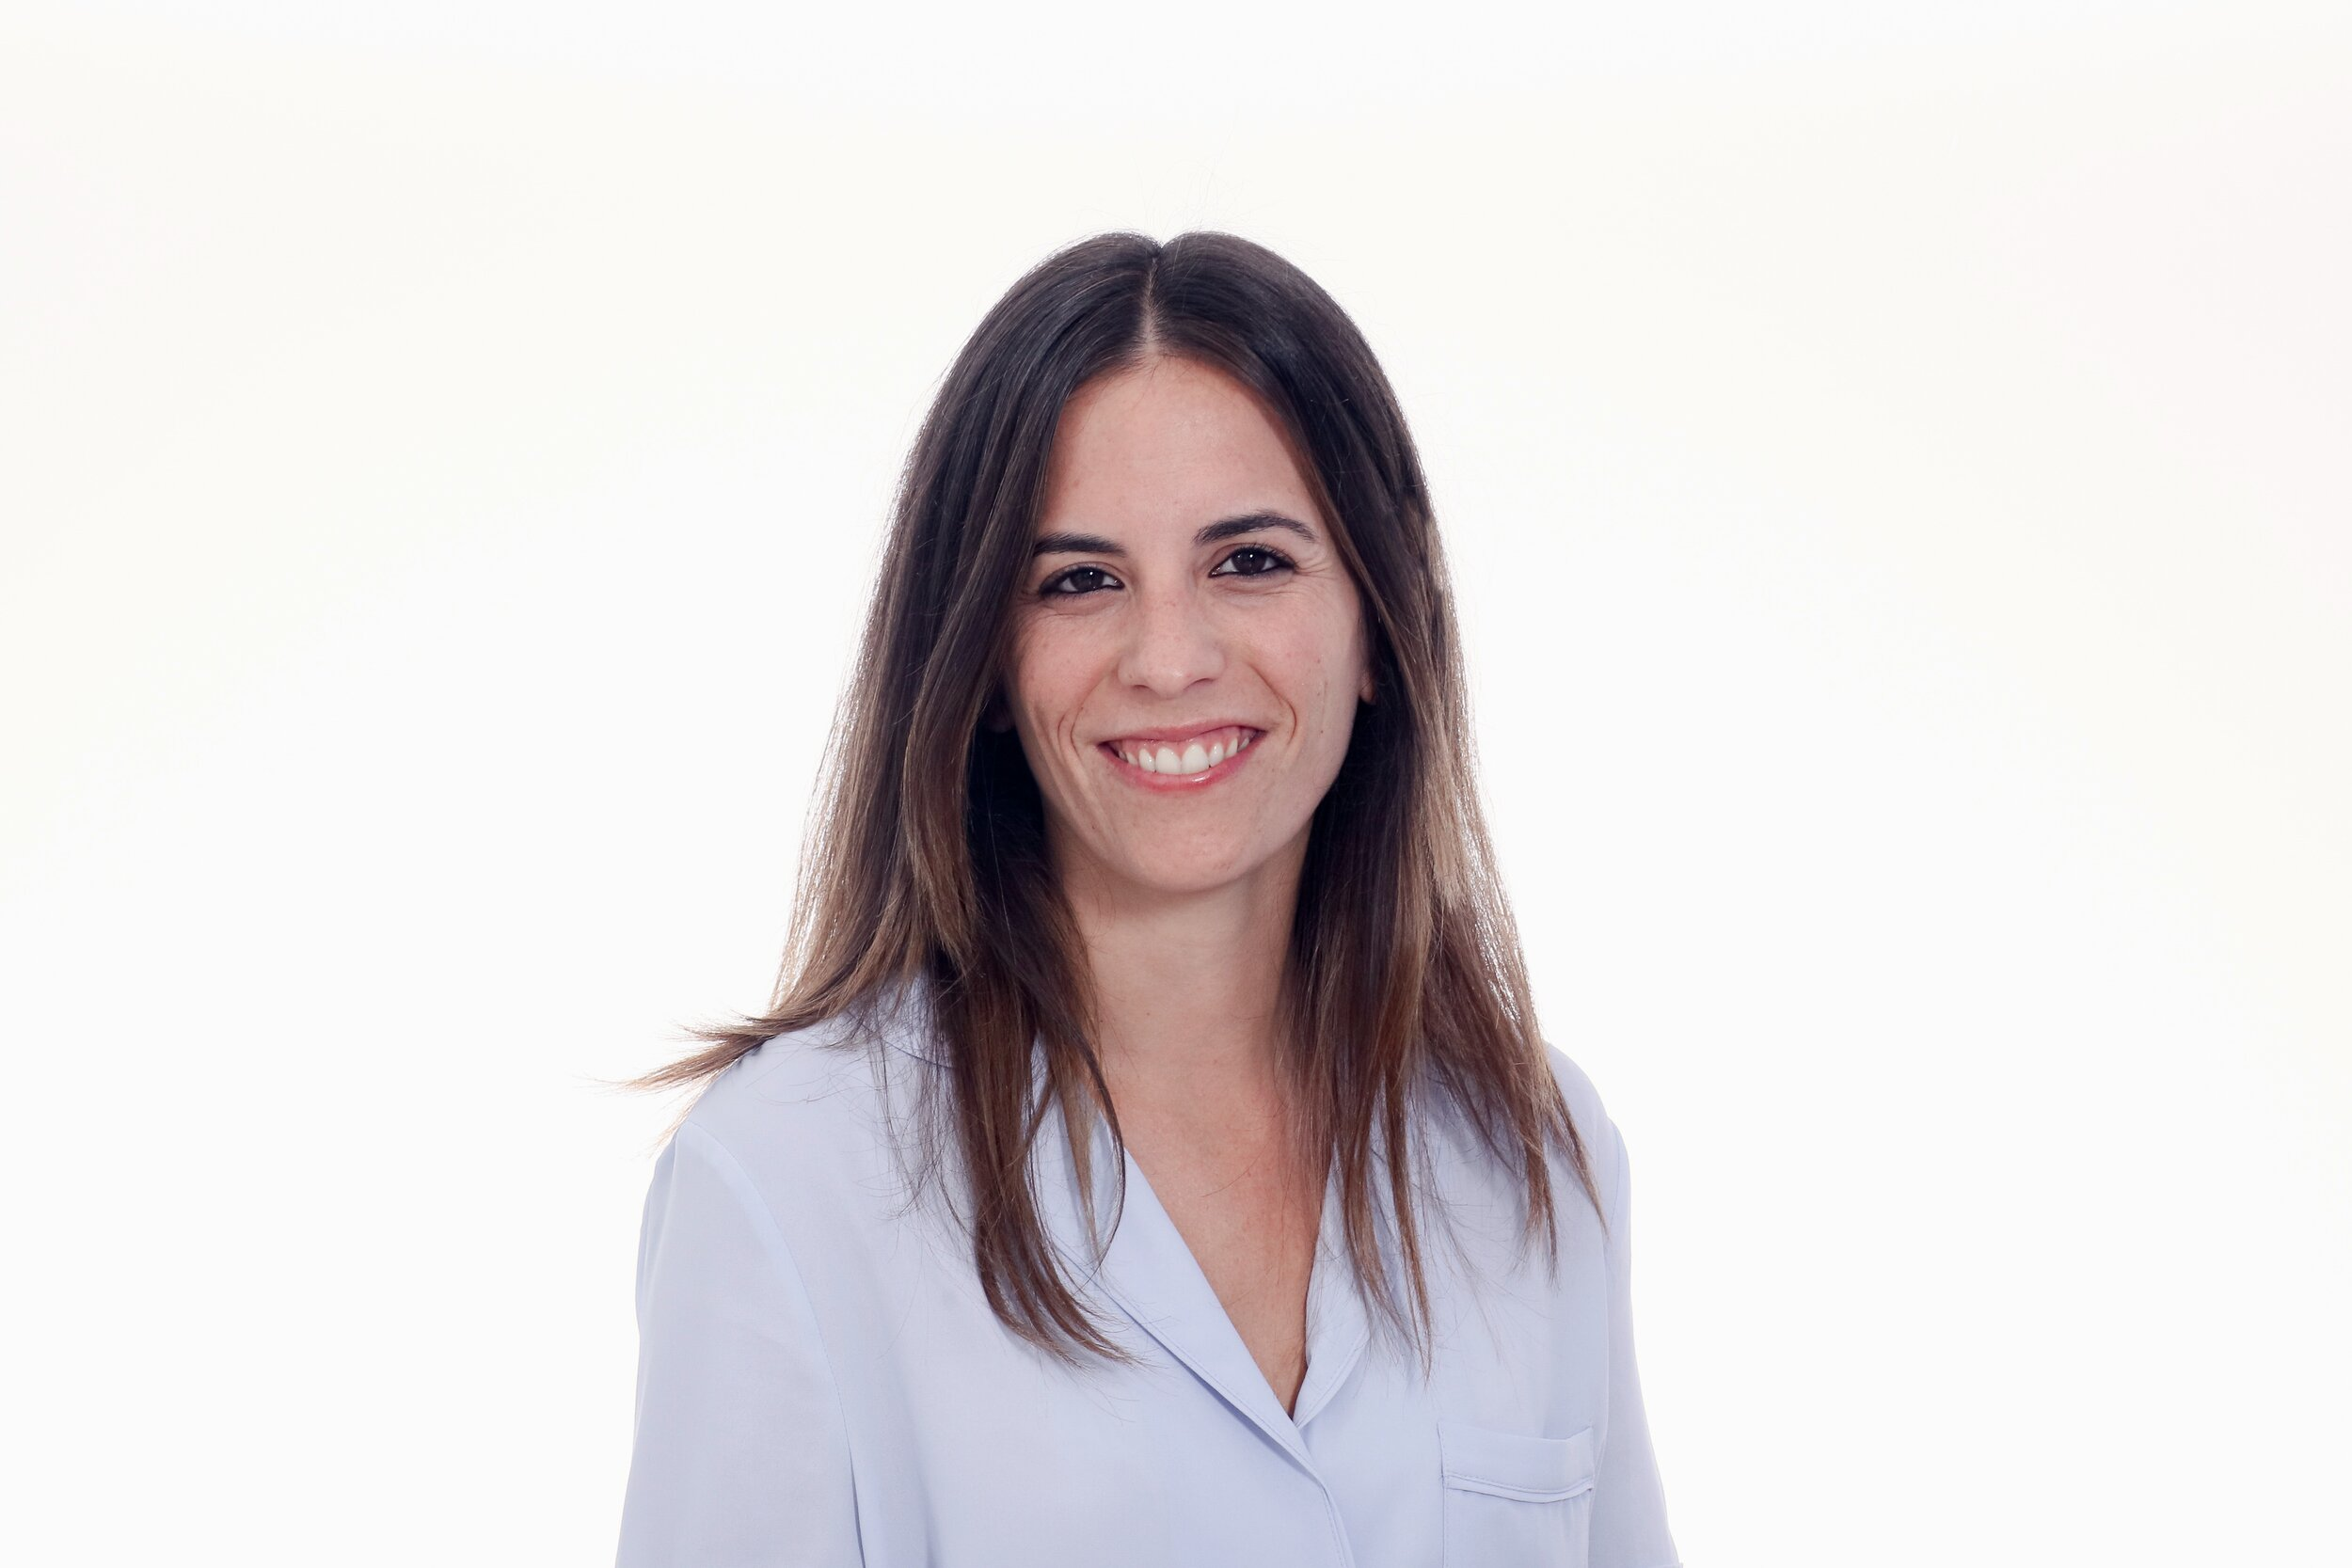 Natalia Sanz Velasco - Psicóloga clínica